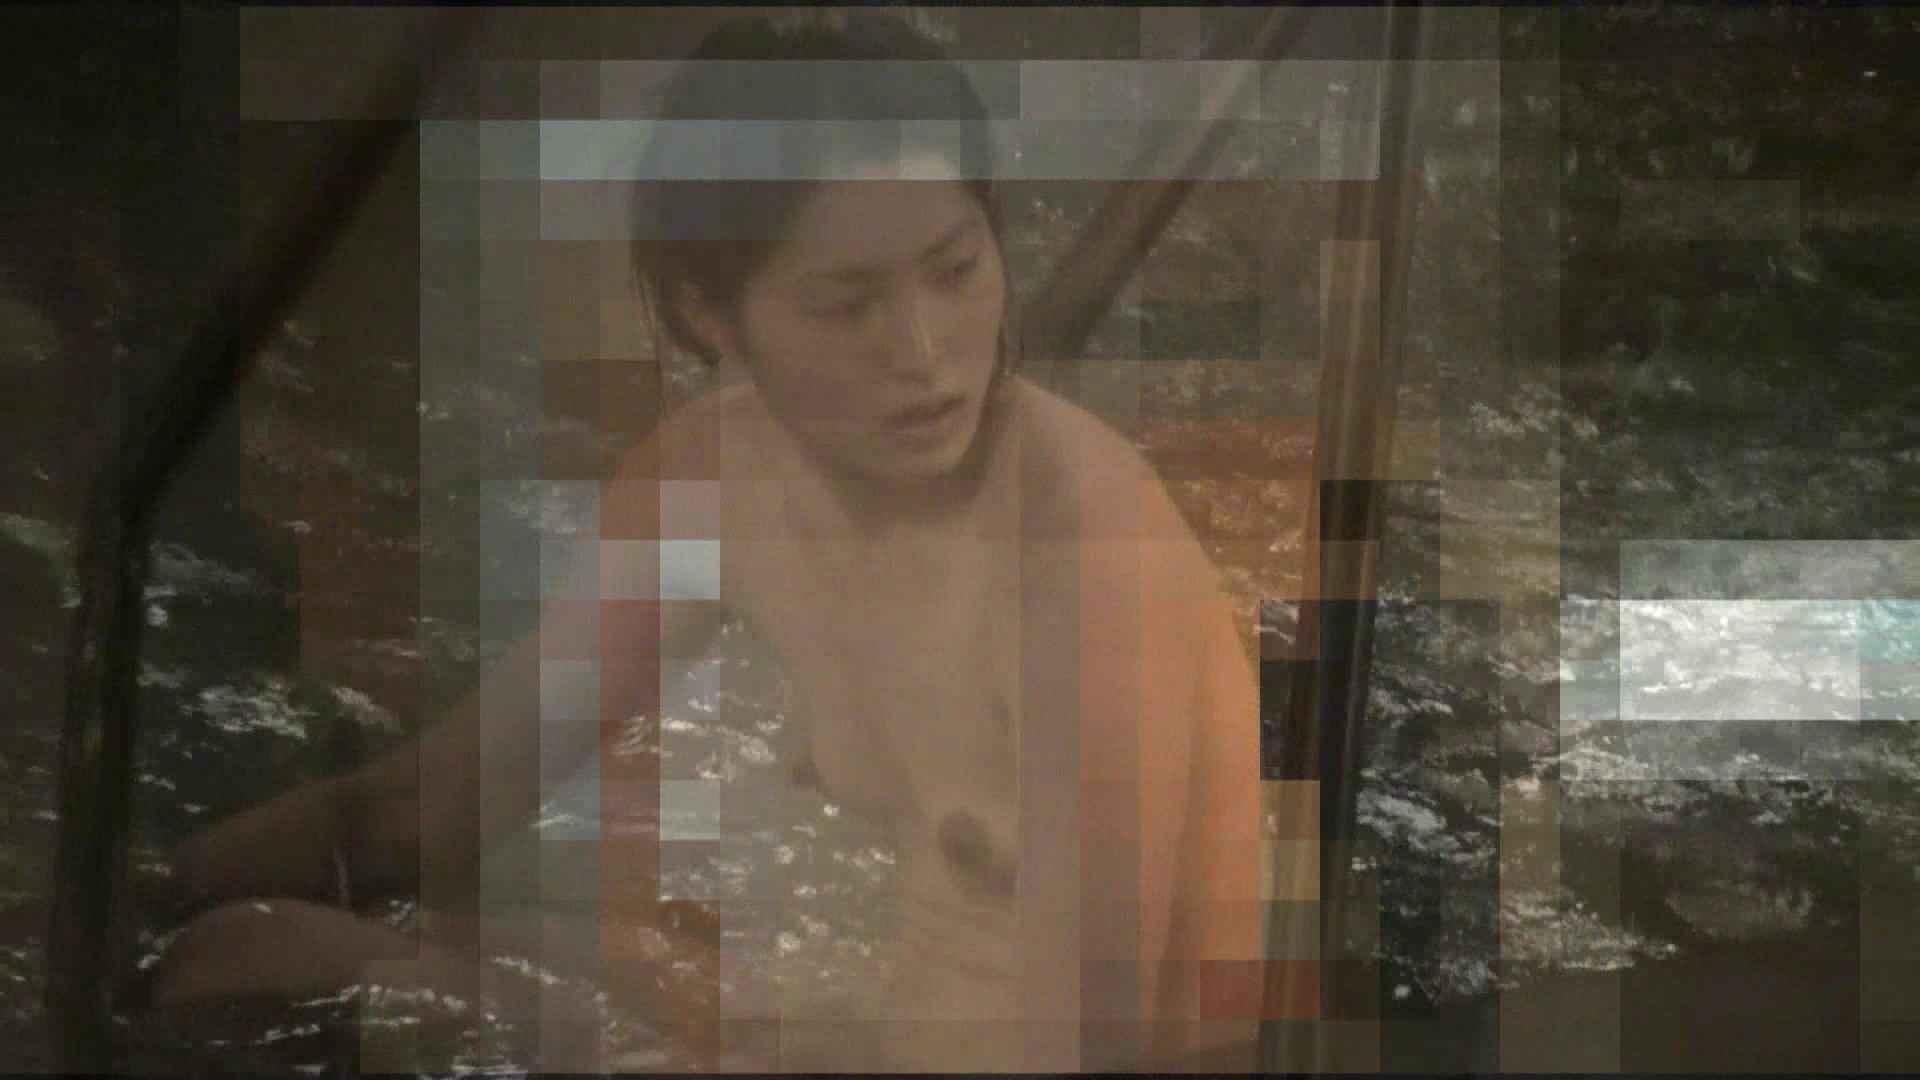 Aquaな露天風呂Vol.406 露天風呂突入 性交動画流出 71pic 20